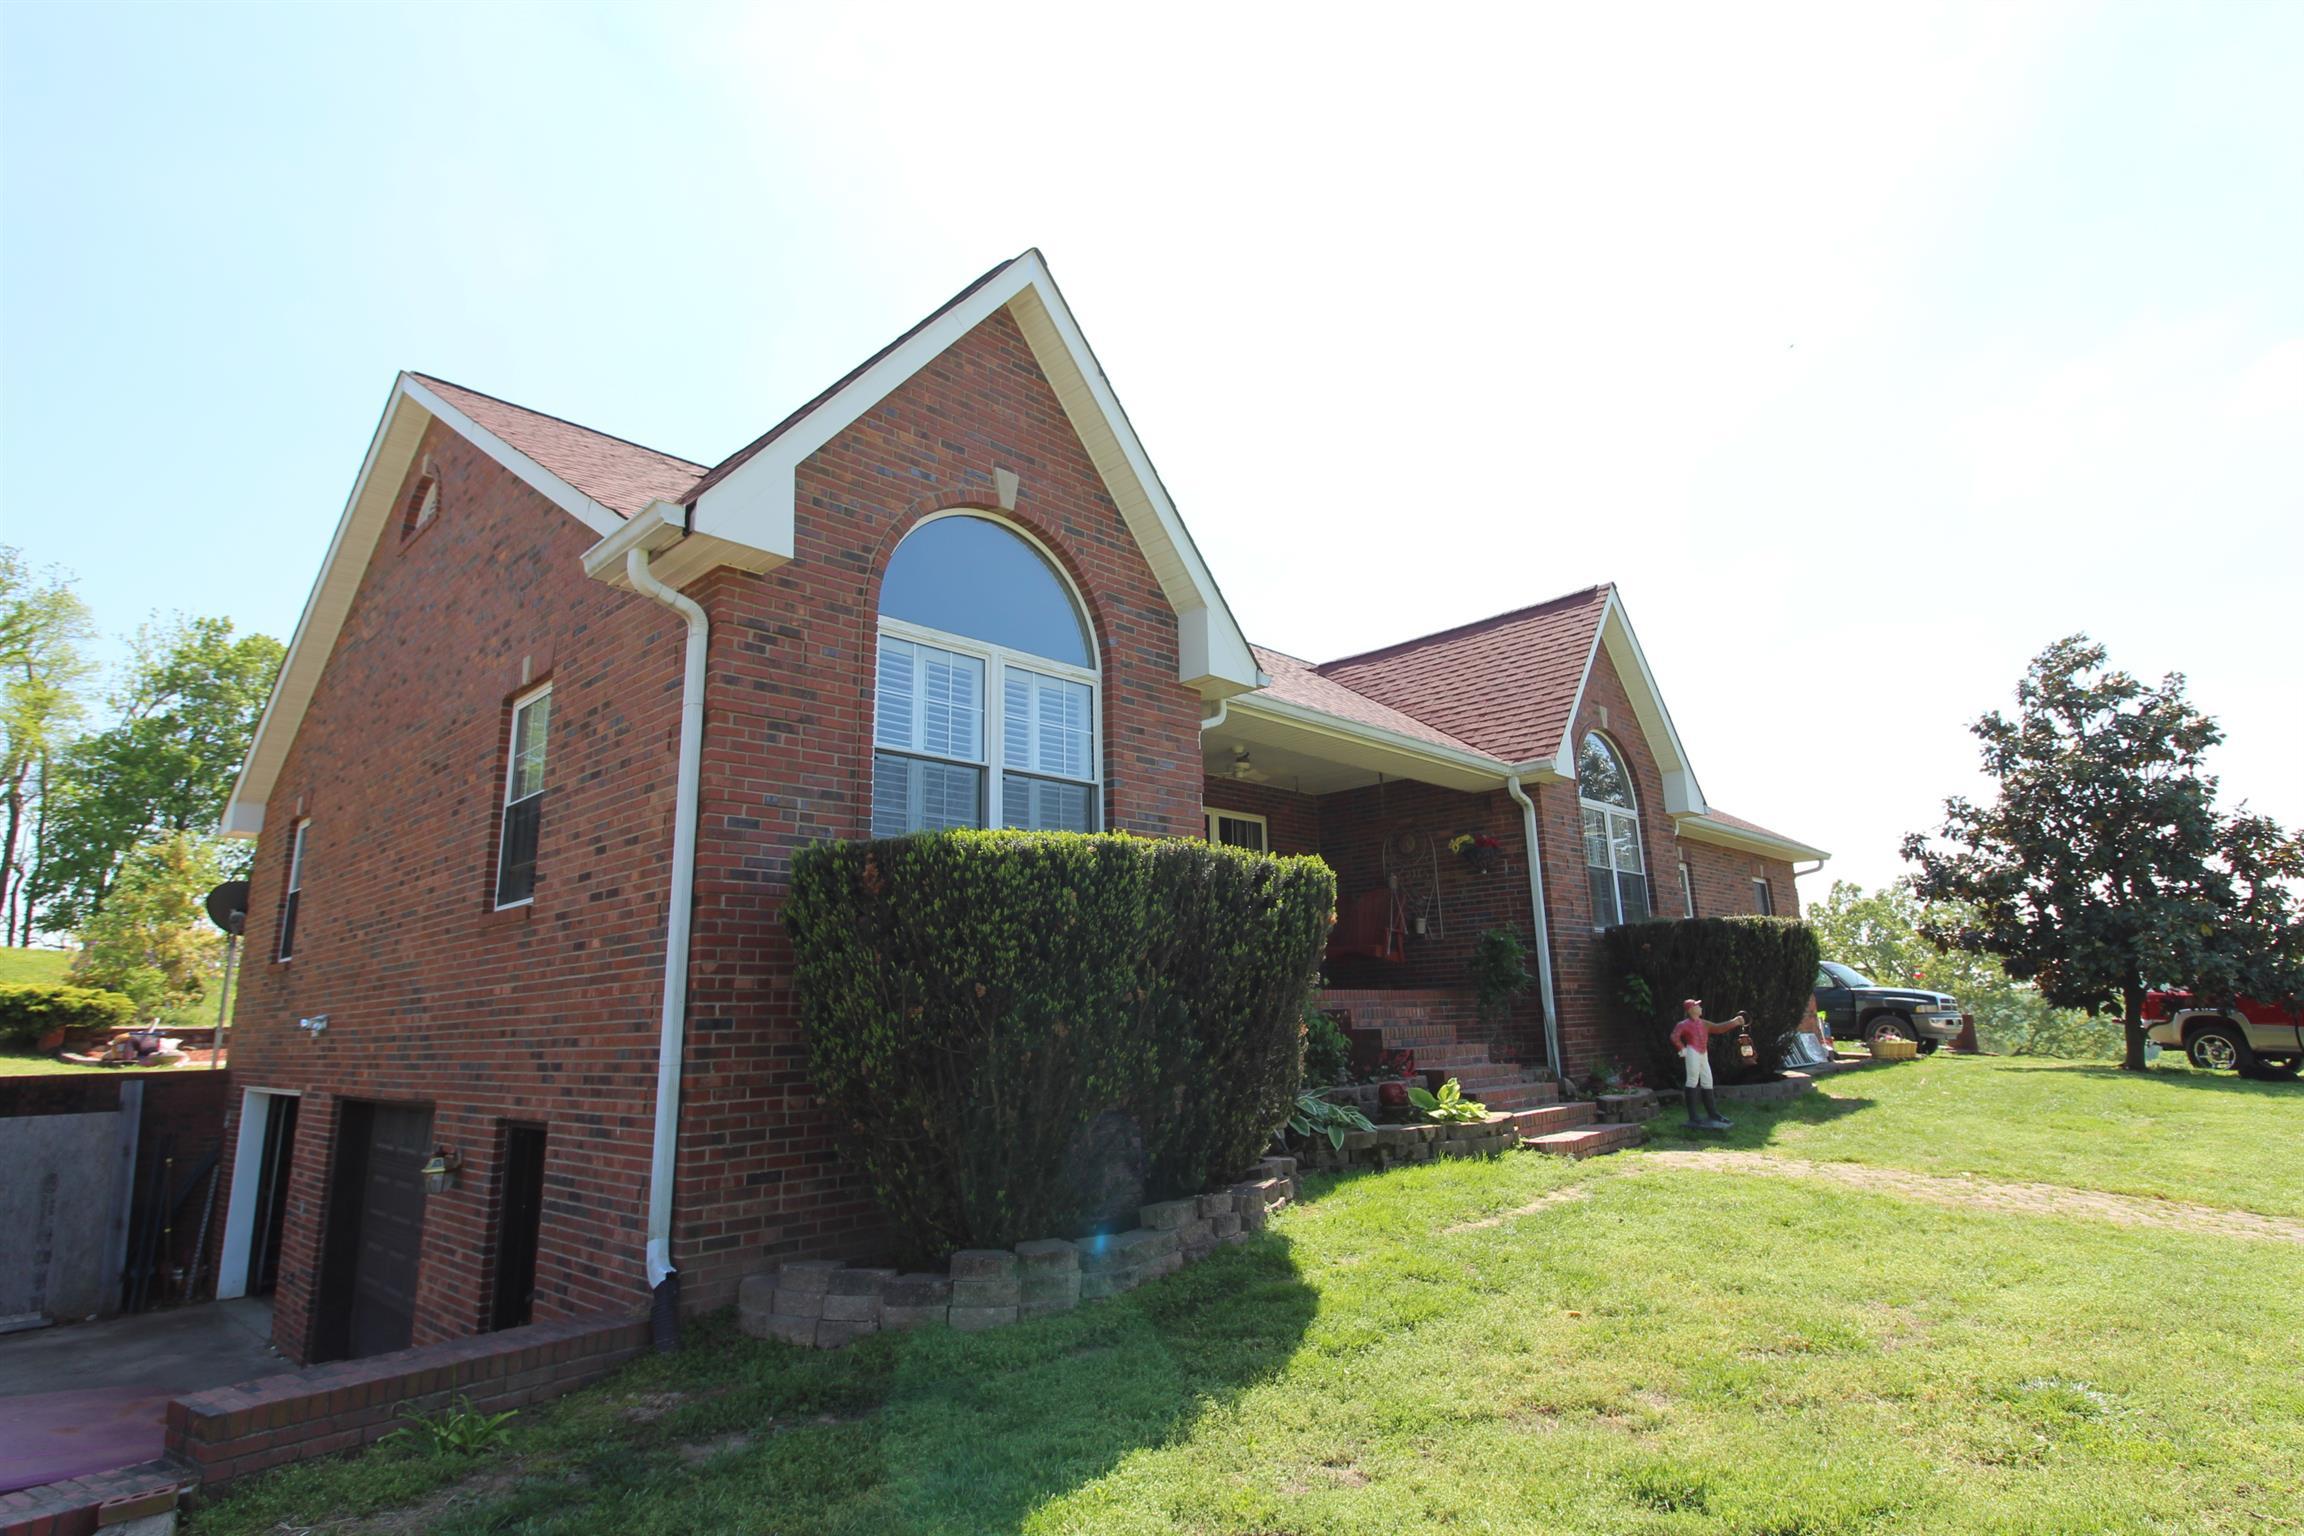 288 Jones Ln, Ashland City, TN 37015 - Ashland City, TN real estate listing